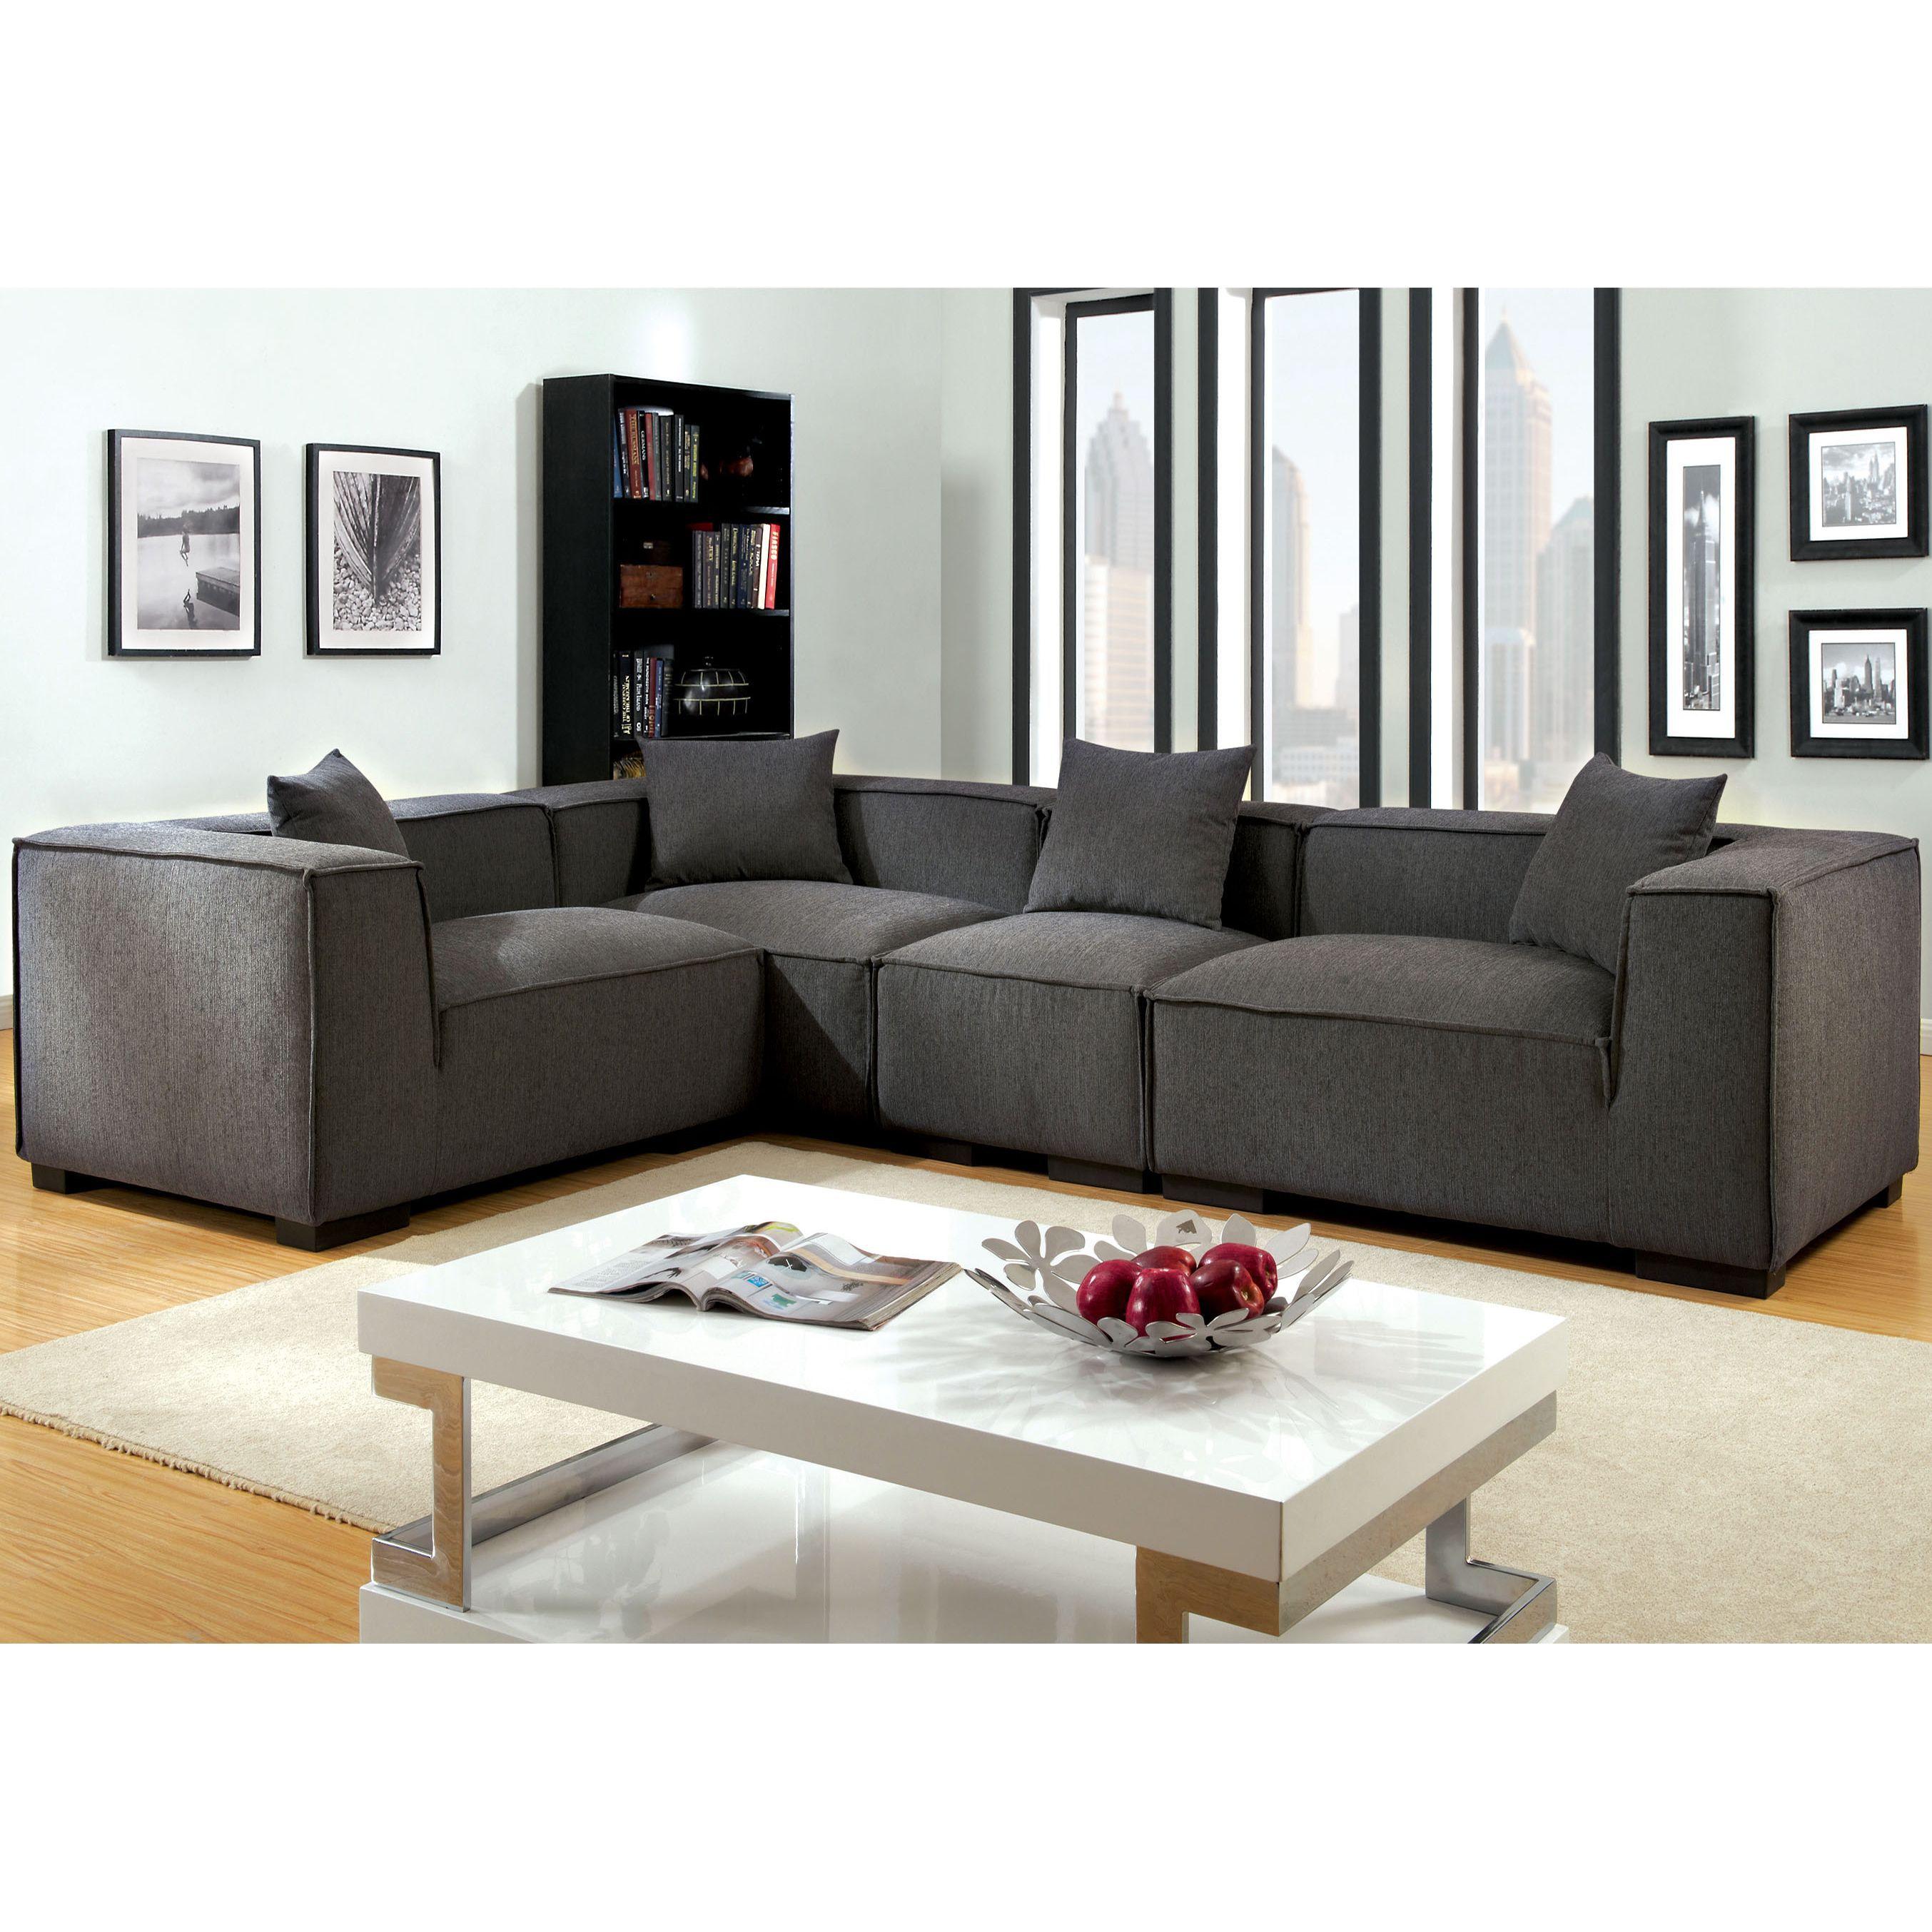 Furniture of america slaten grey flannelette piece sectional grey